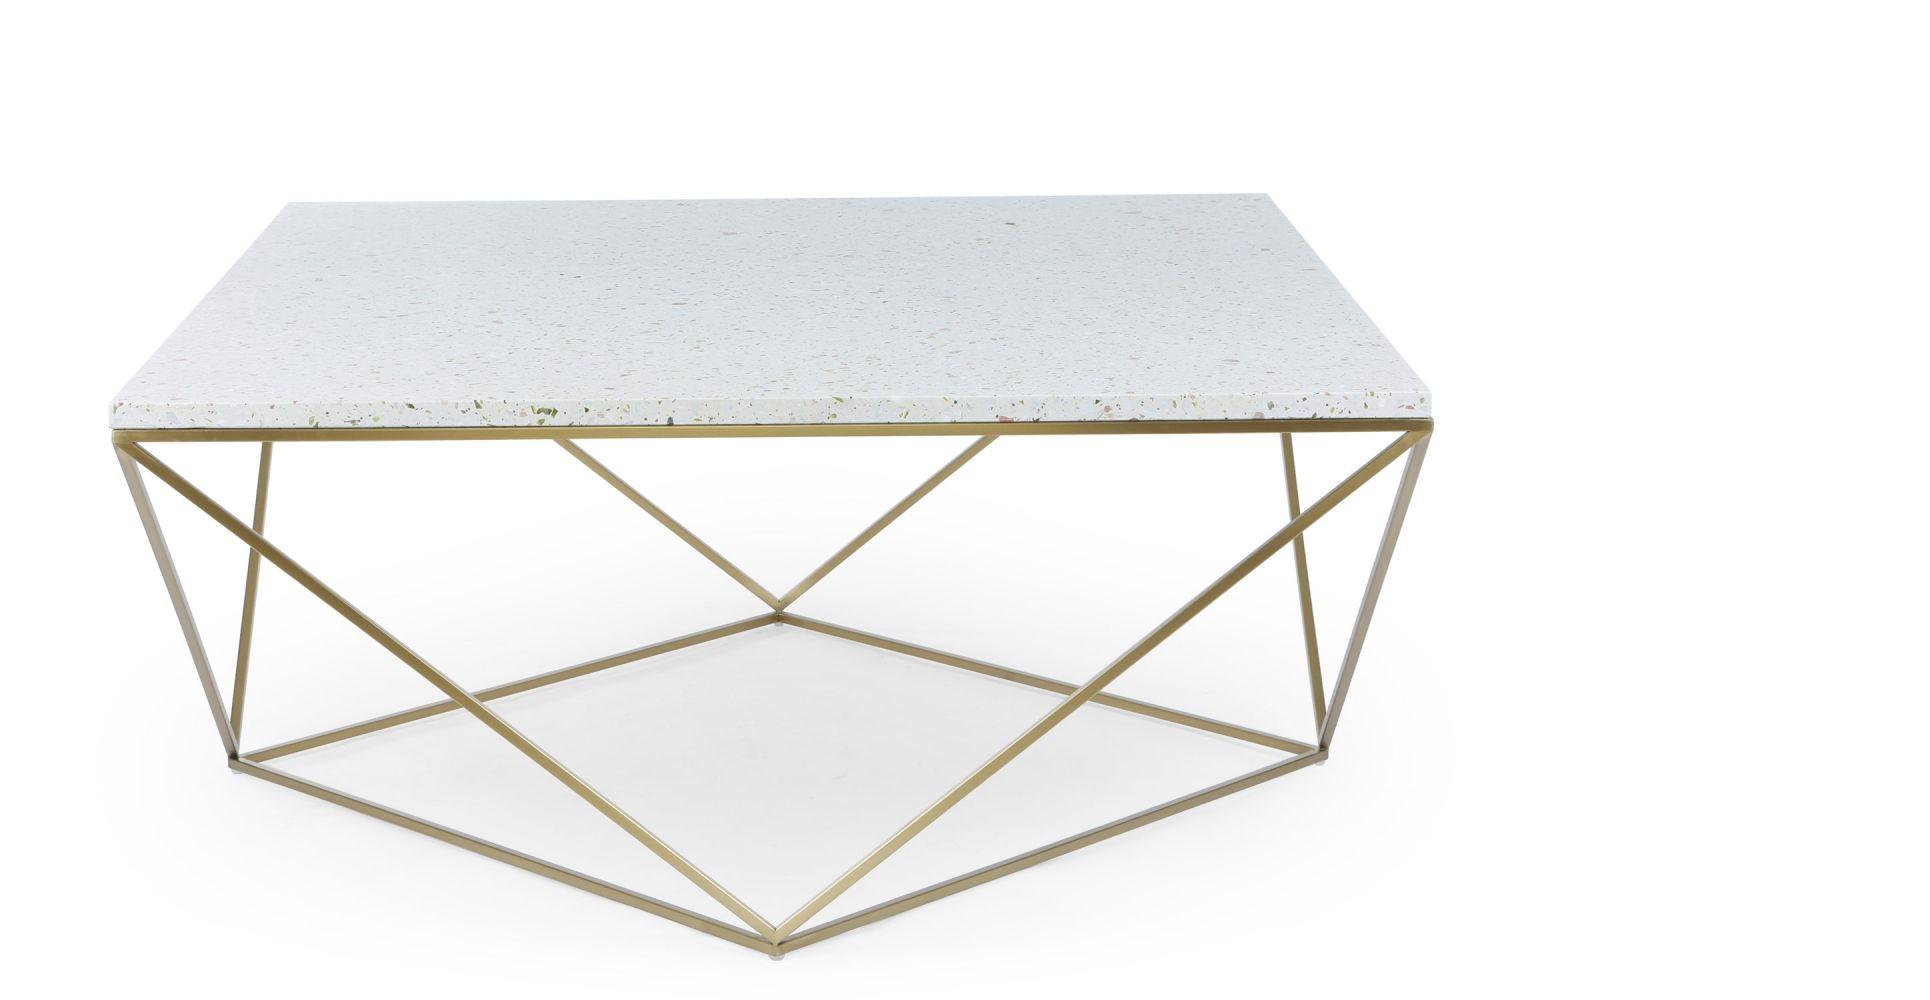 Heroine Nv Gallery Table Basse Marbre Table Basse Table Basse Marbre Blanc